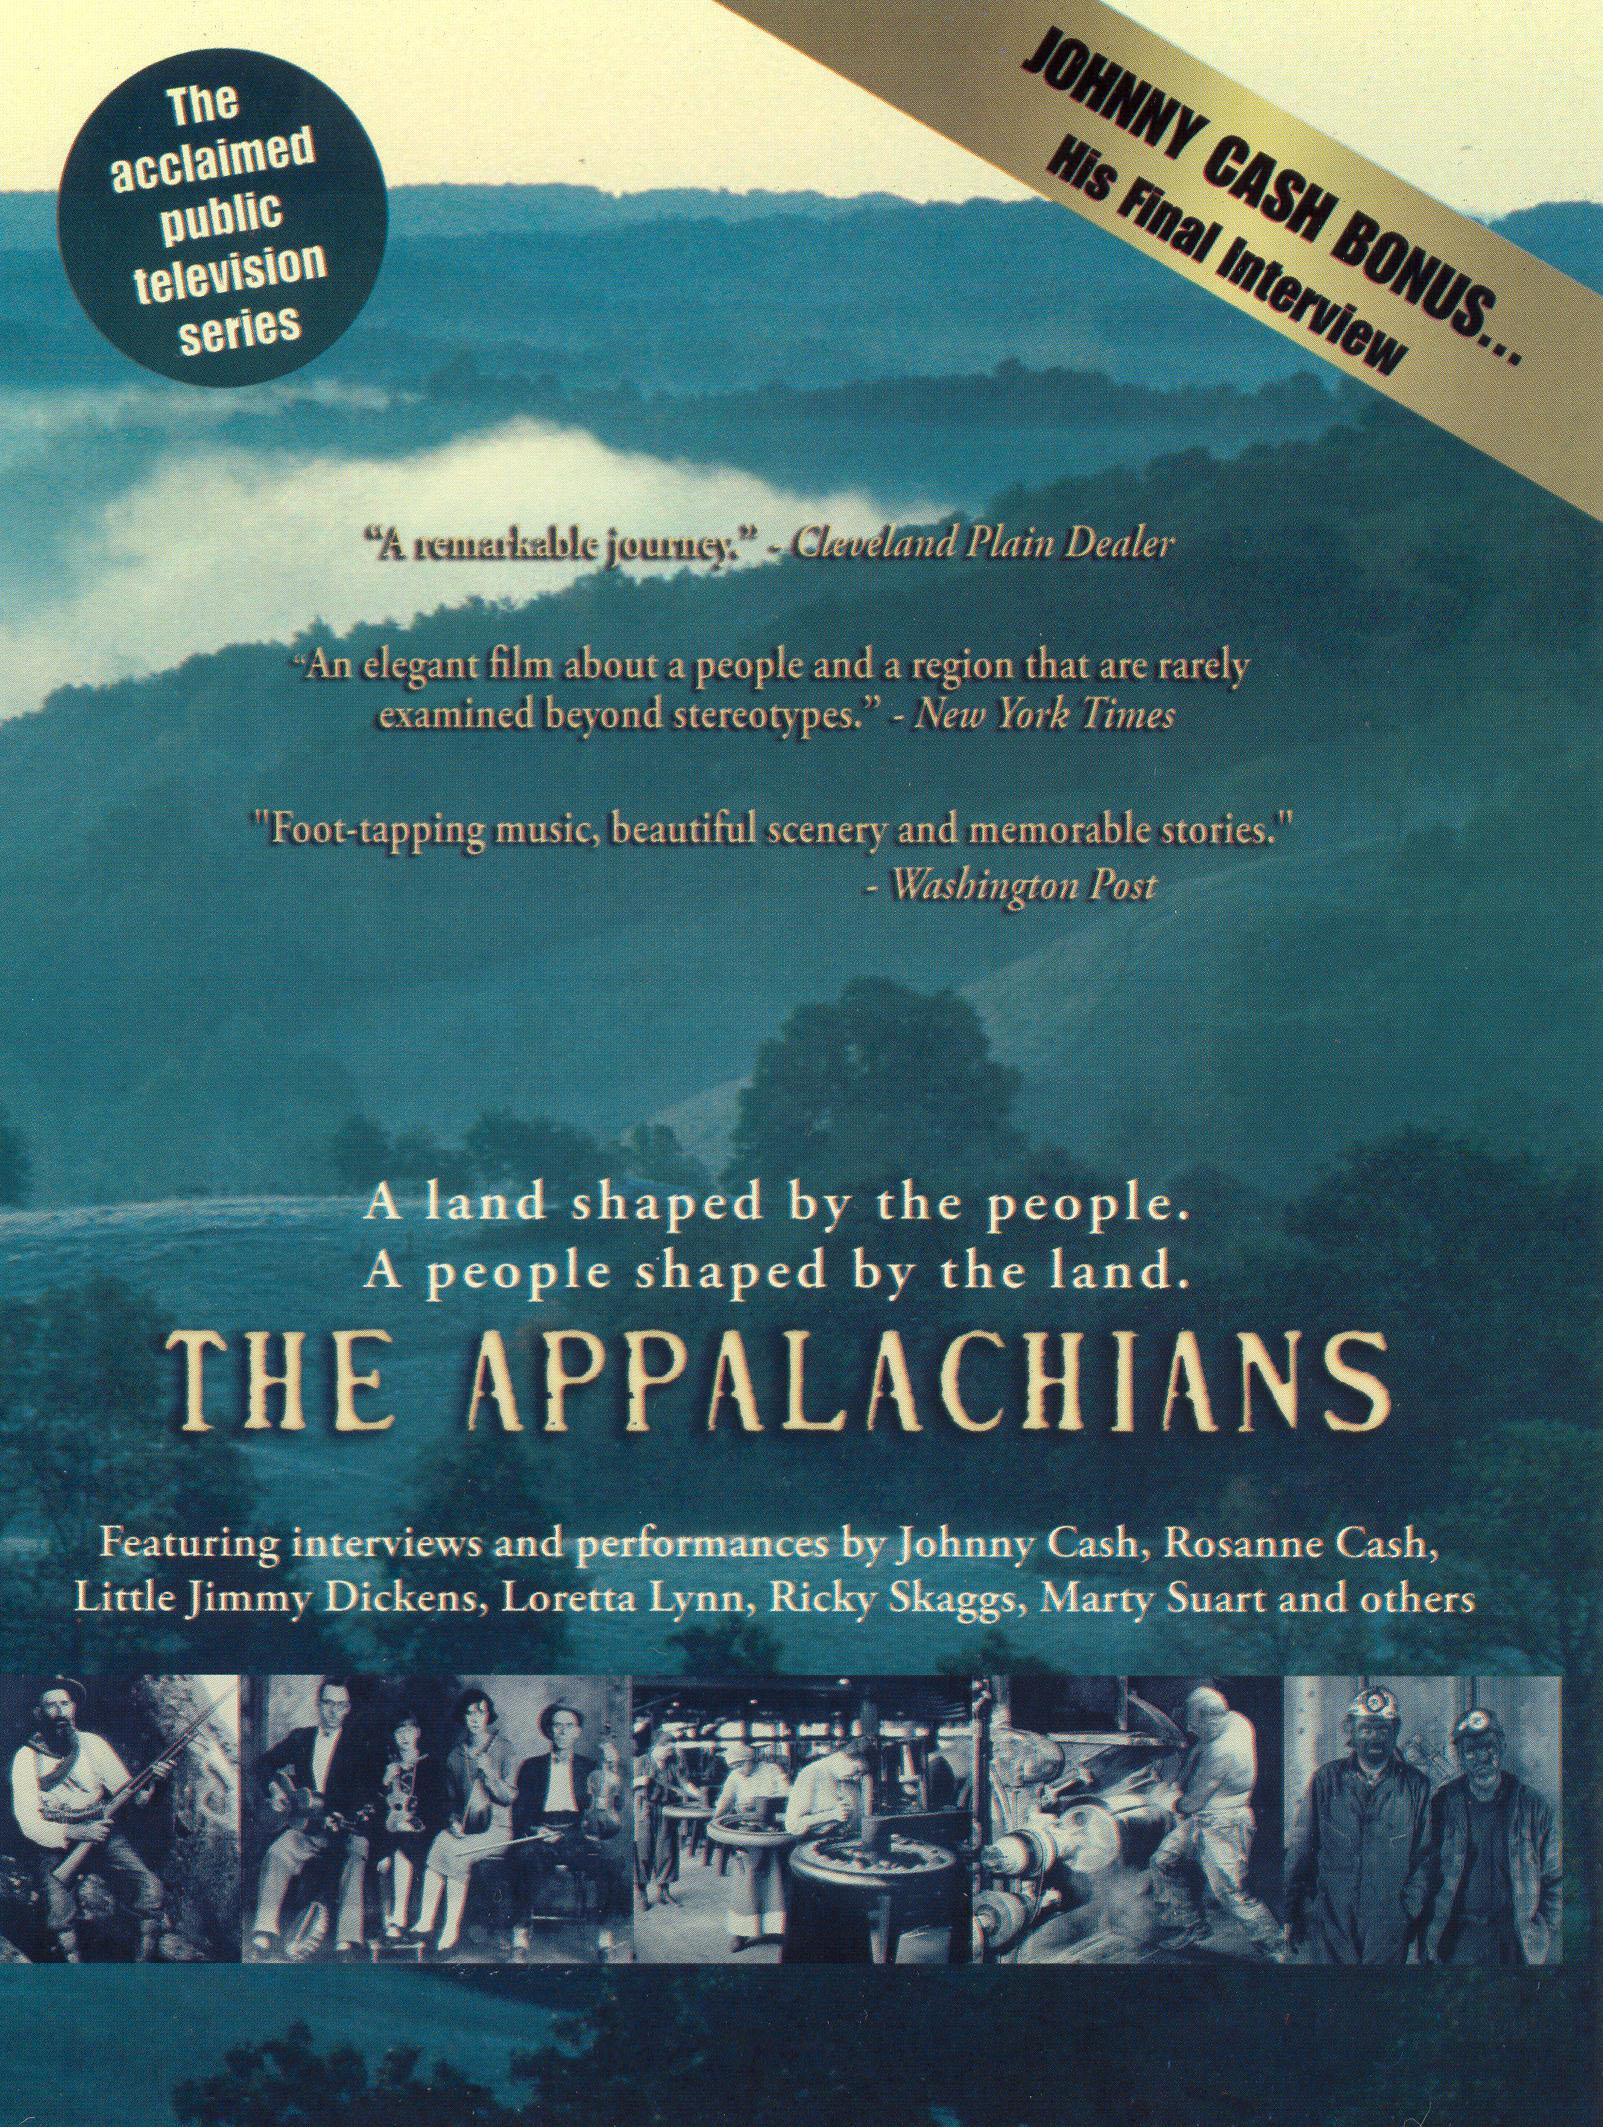 The Appalachians